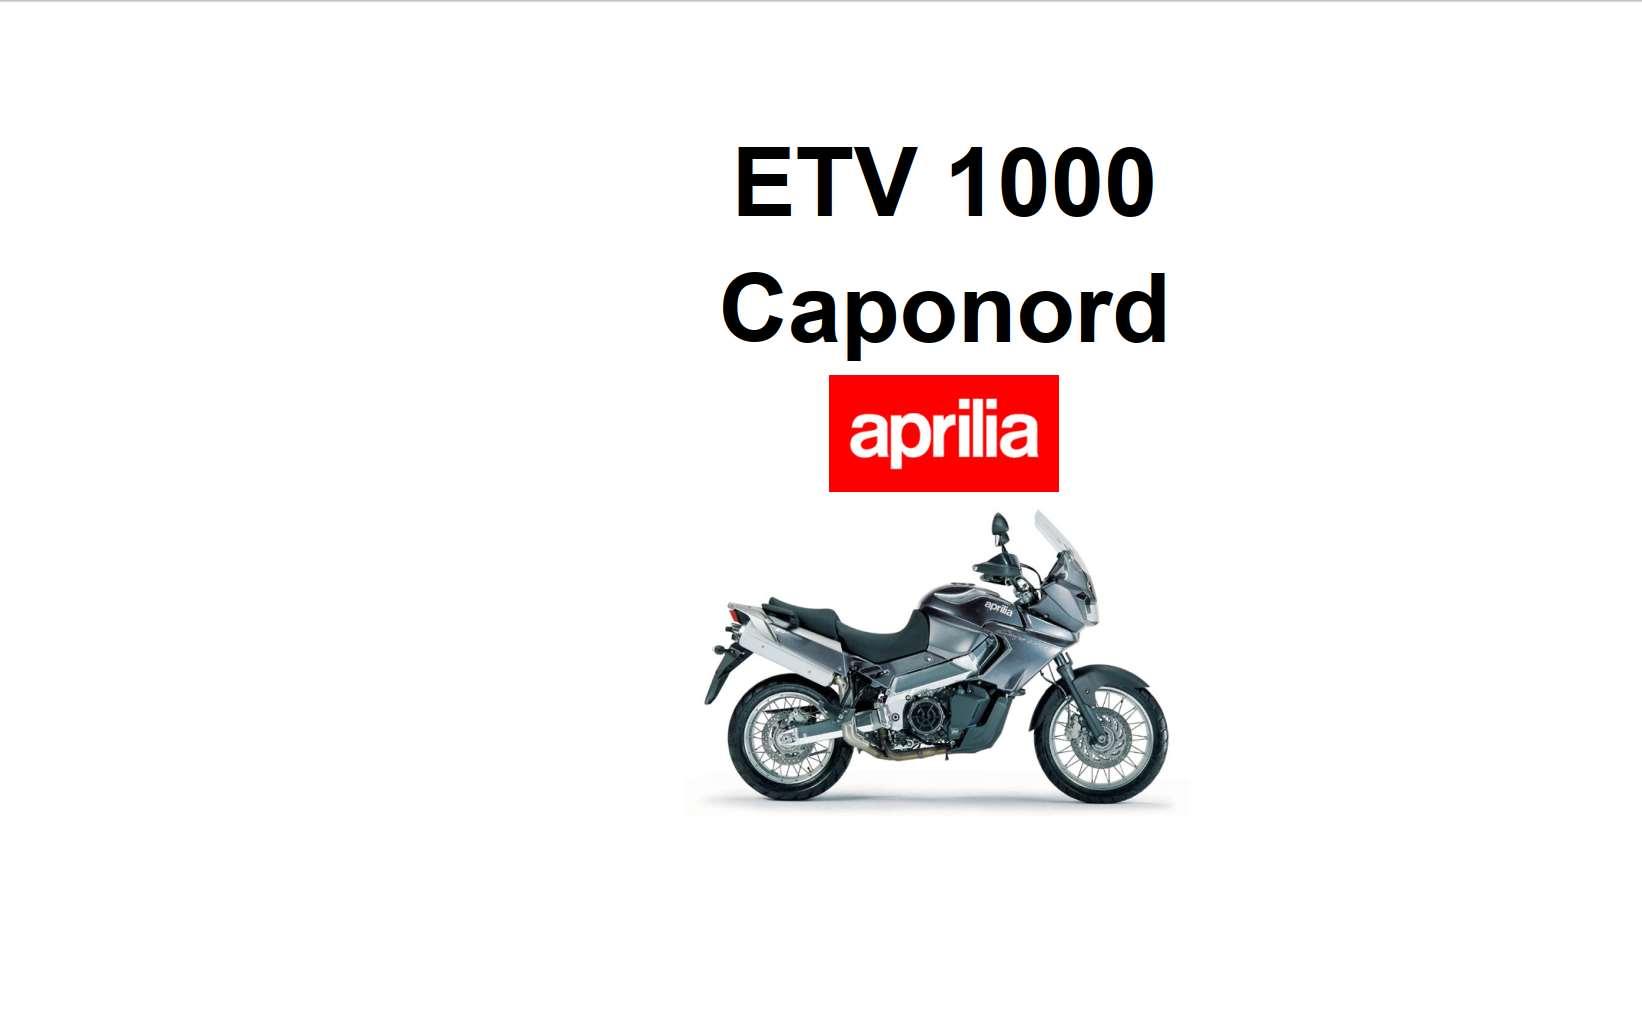 Aprilia ETV 1000 Caponord 2007 Owner's Manual